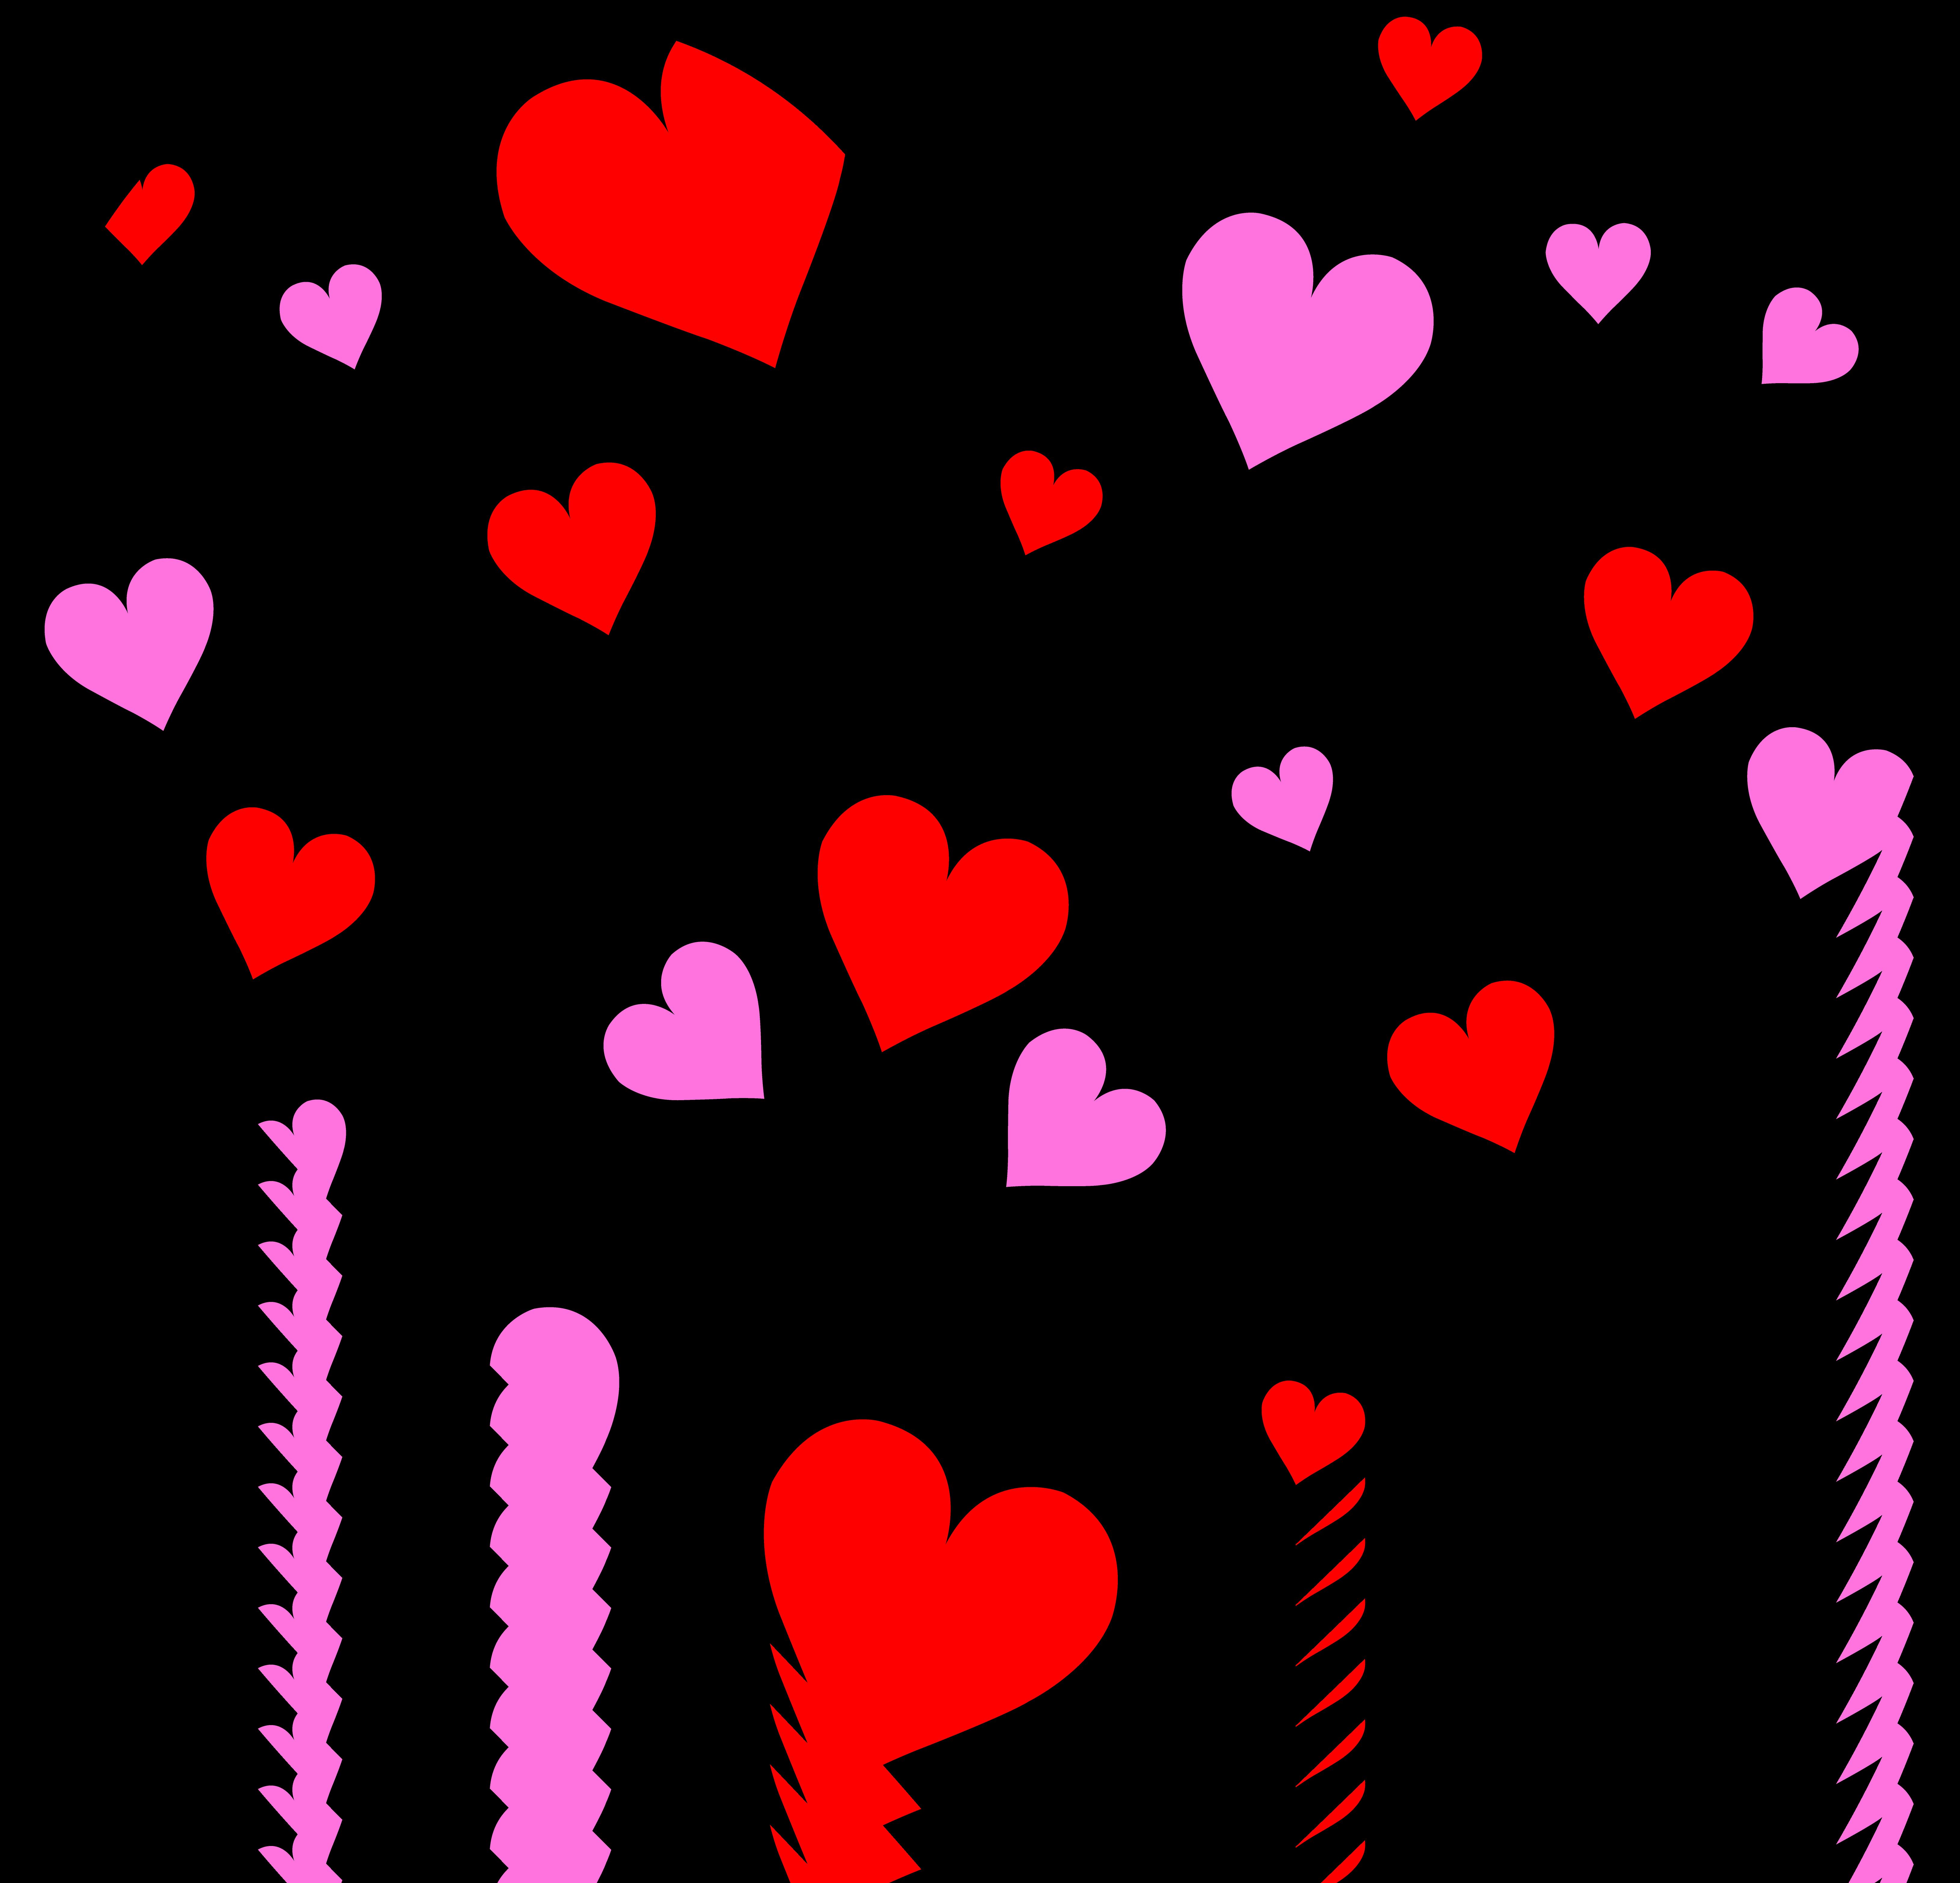 clipart love heart clipart panda free clipart images [ 6516 x 6261 Pixel ]